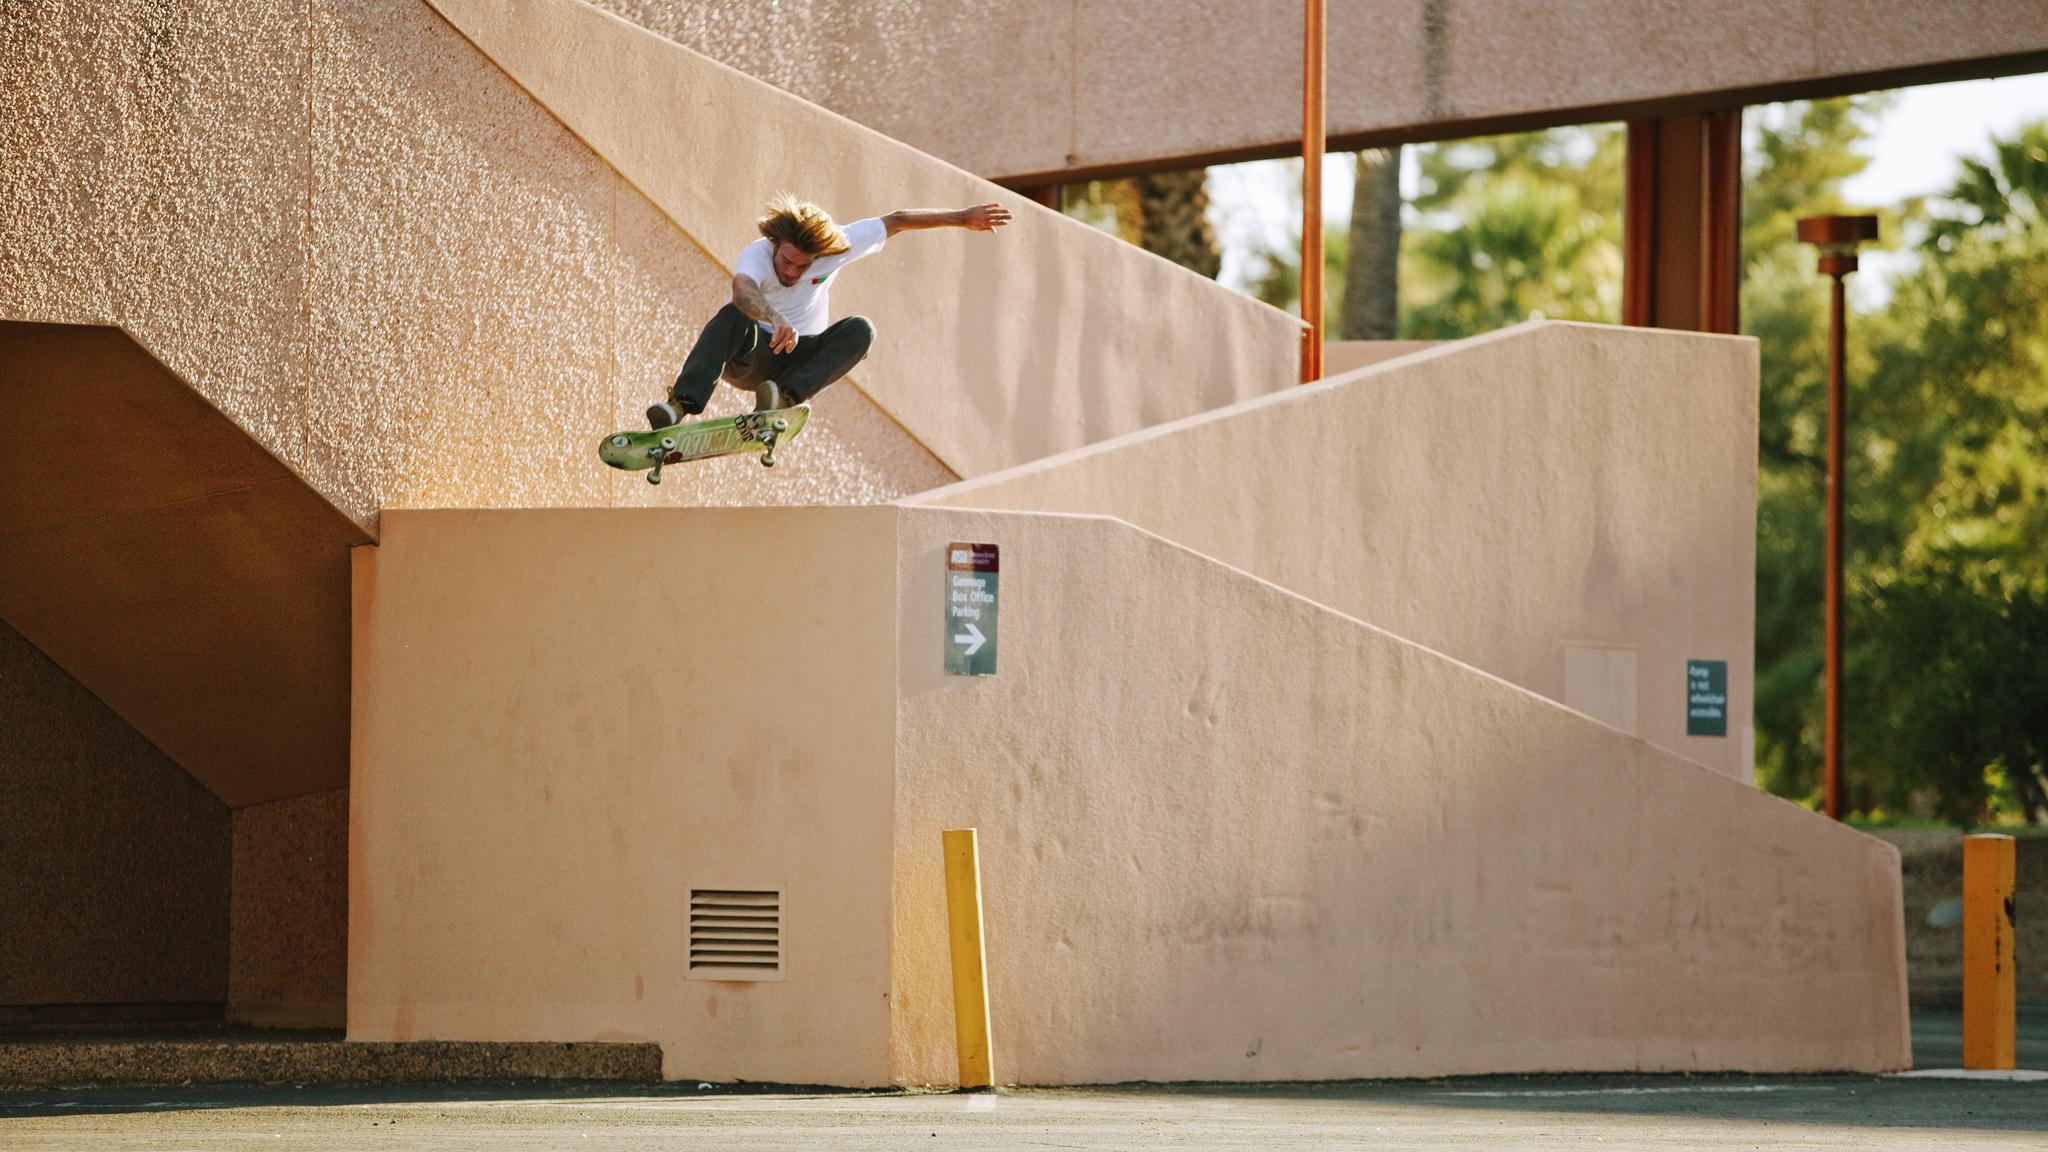 Steven Snyder, Phoenix, Arizona